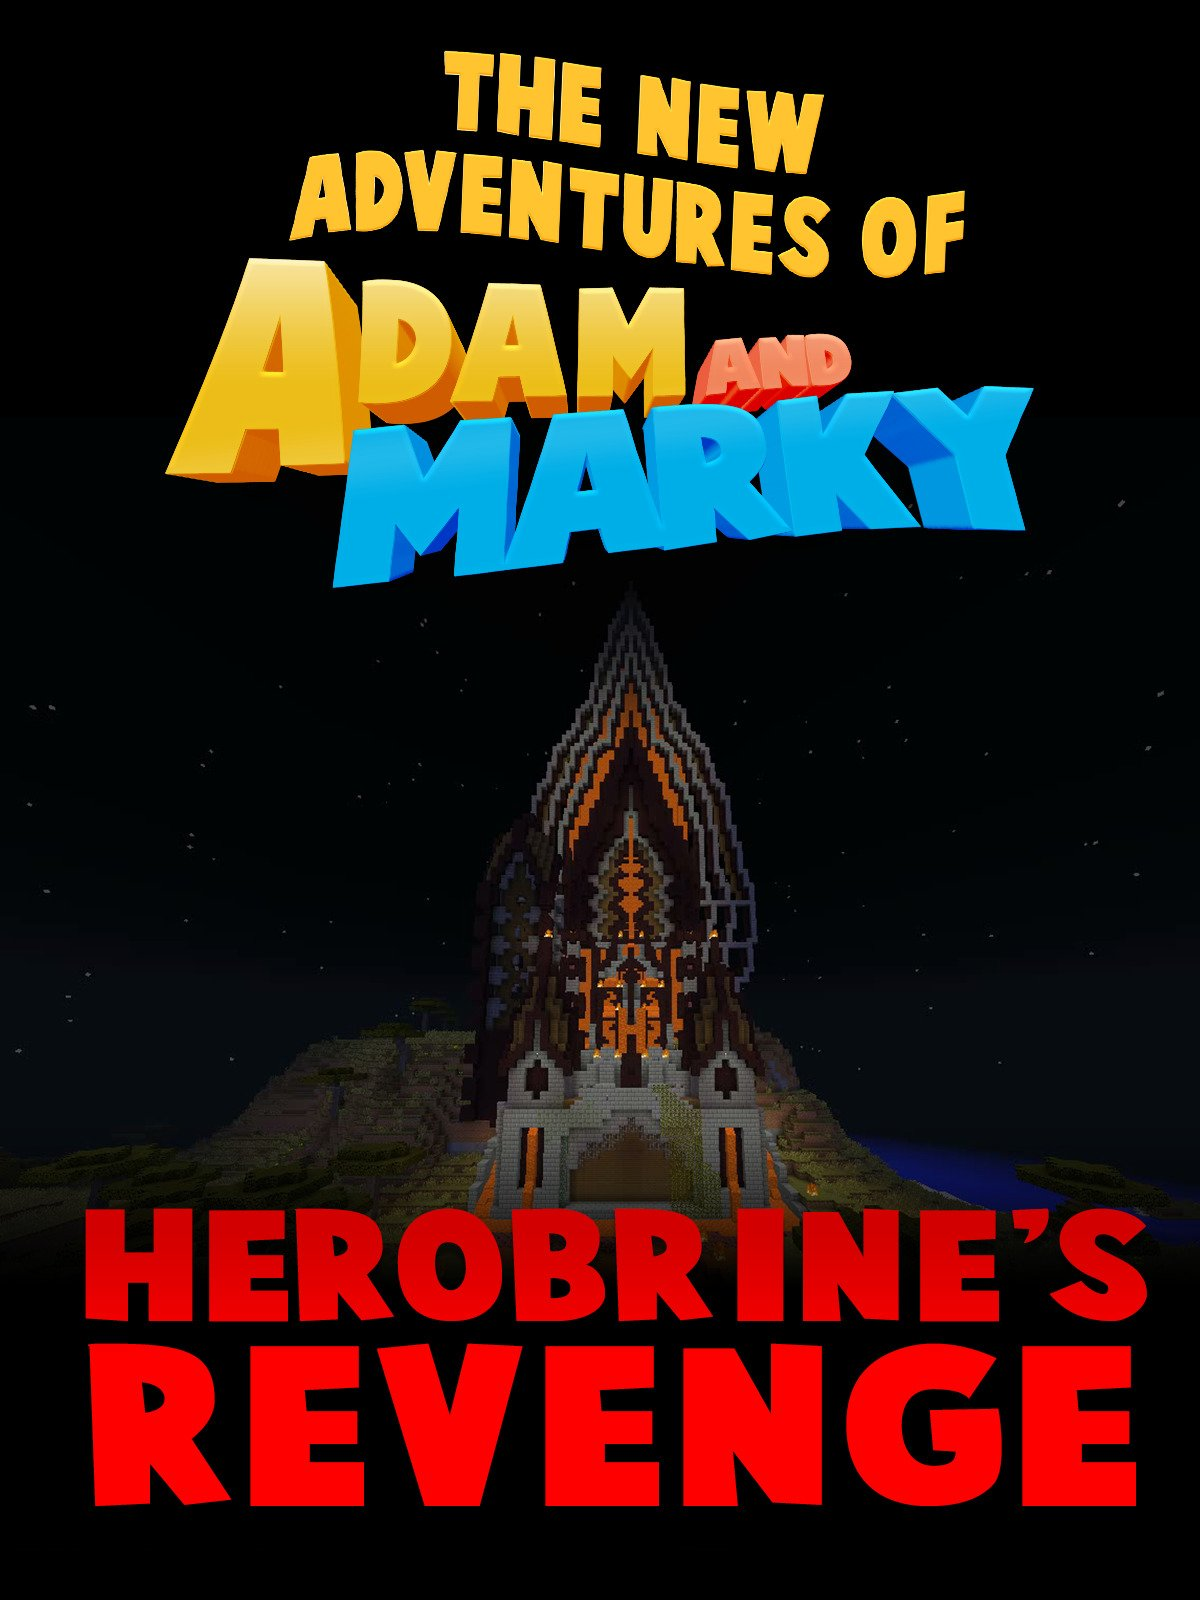 The New Adventures of Adam and Marky Herobrine's Revenge on Amazon Prime Video UK